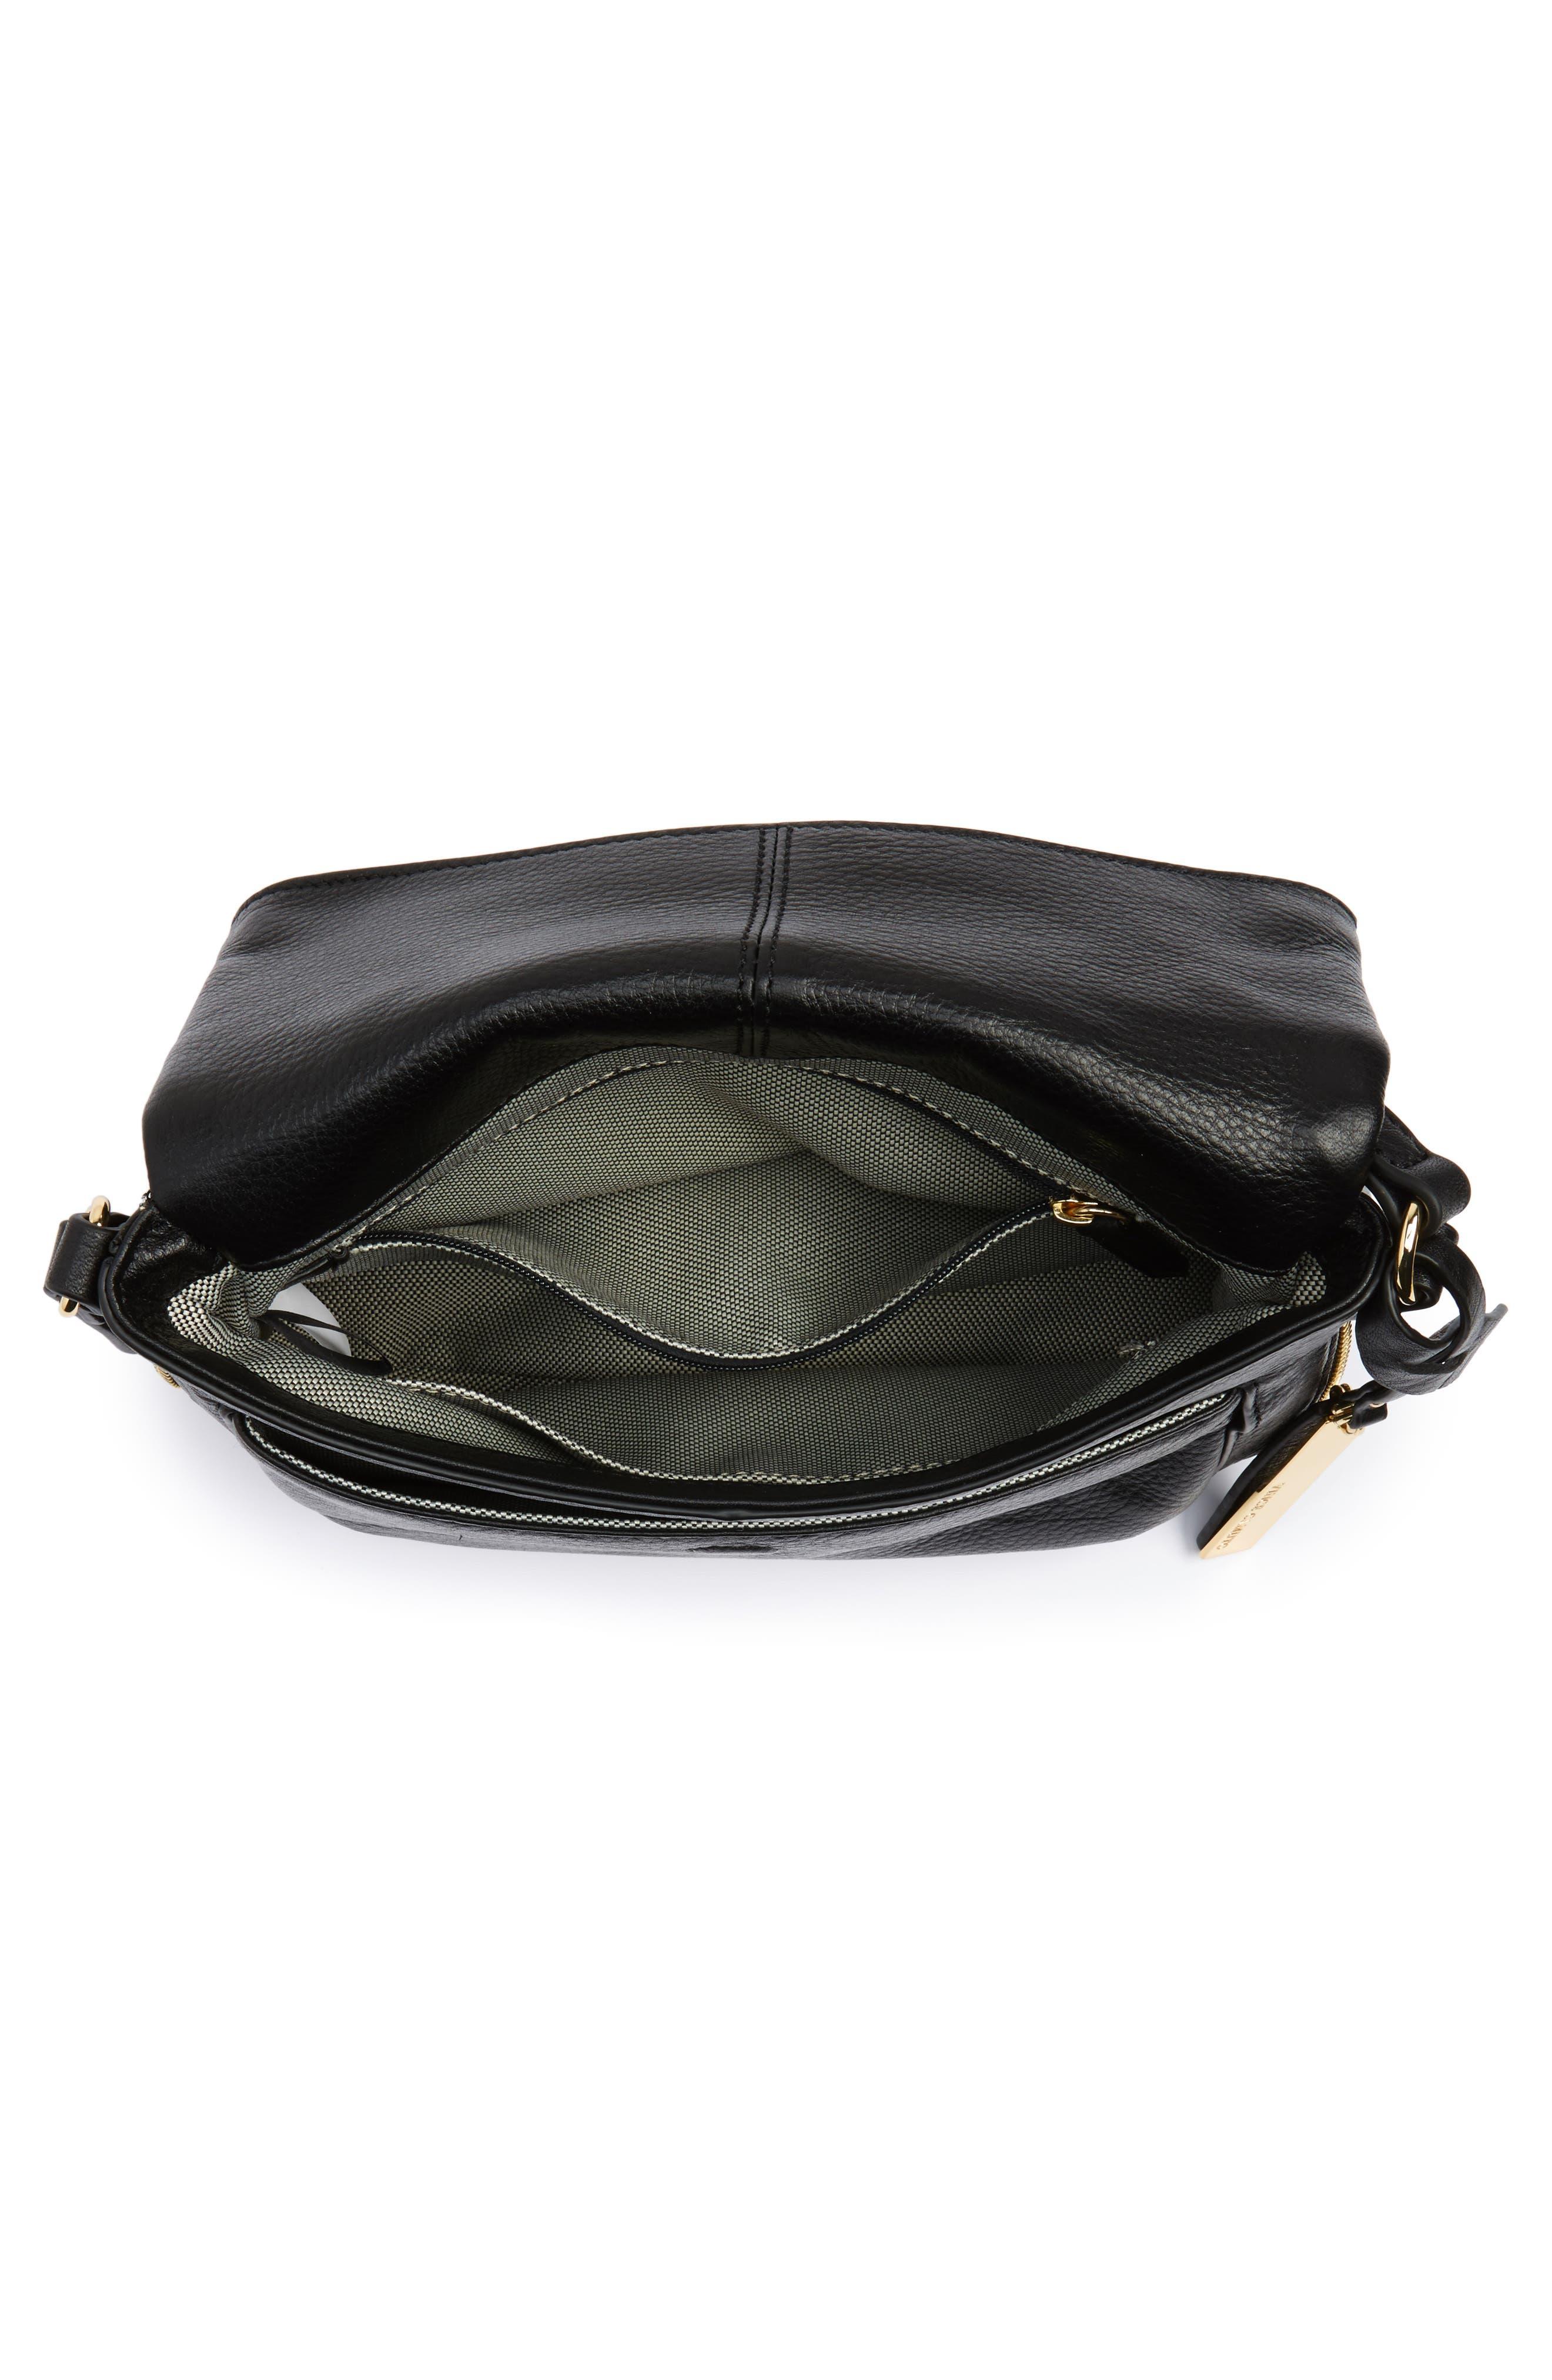 Adina Leather Crossbody Bag,                             Alternate thumbnail 4, color,                             001